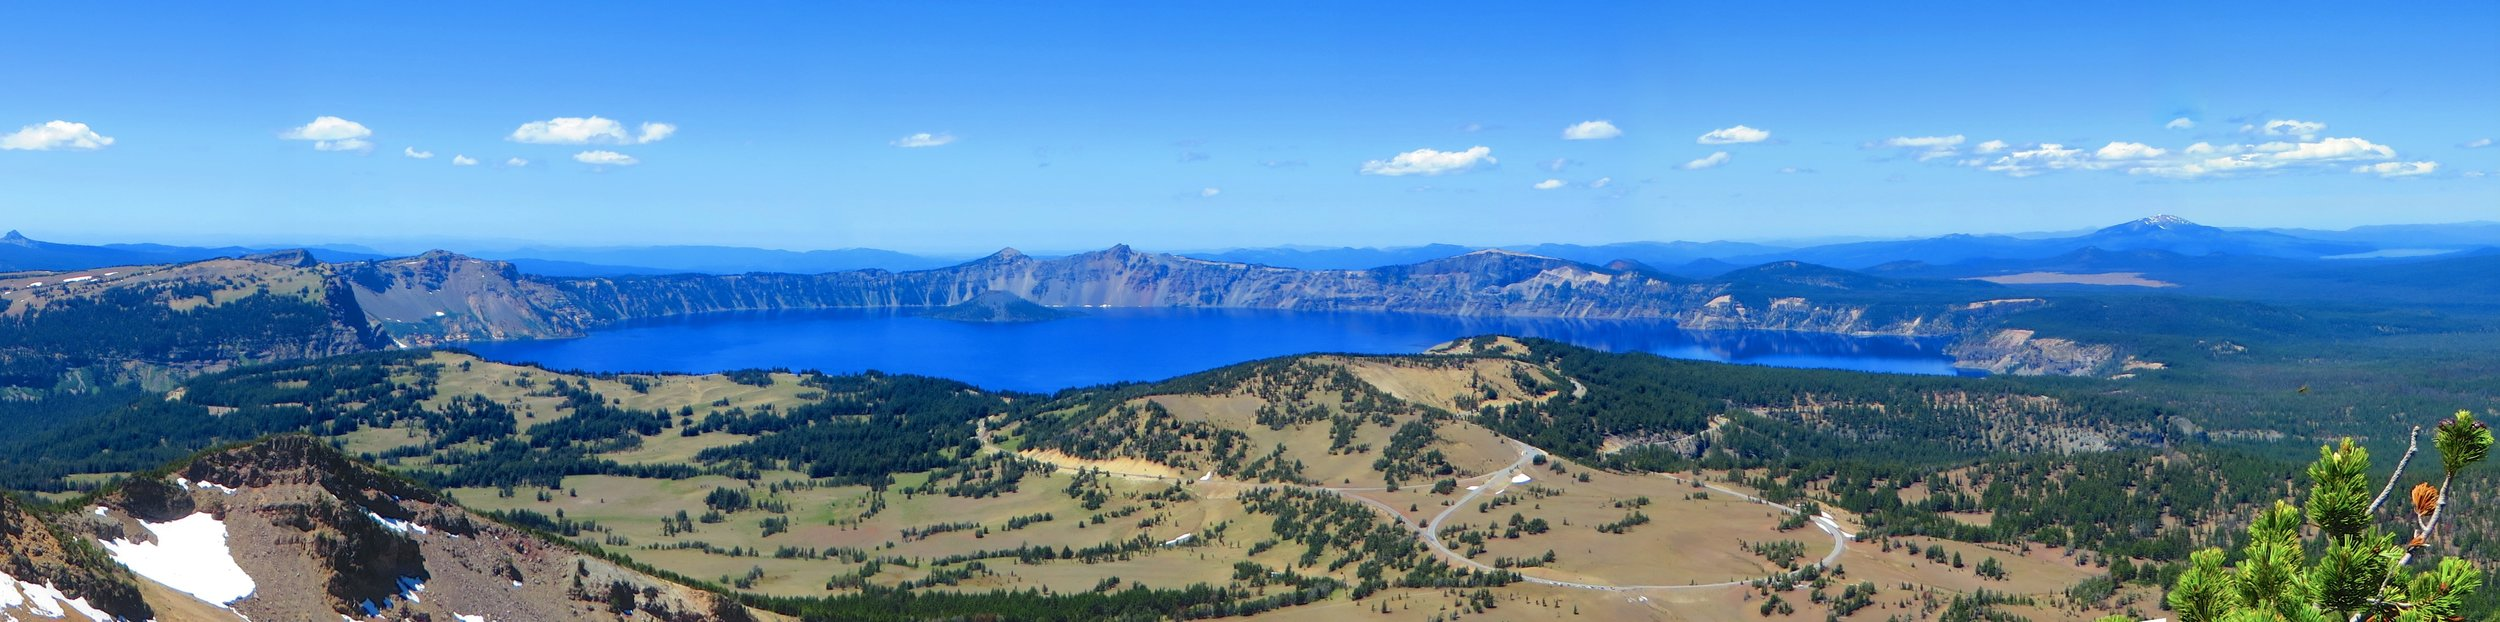 Crater-Lake-cropped-panorama-from-Mount-Scott-hike.jpg